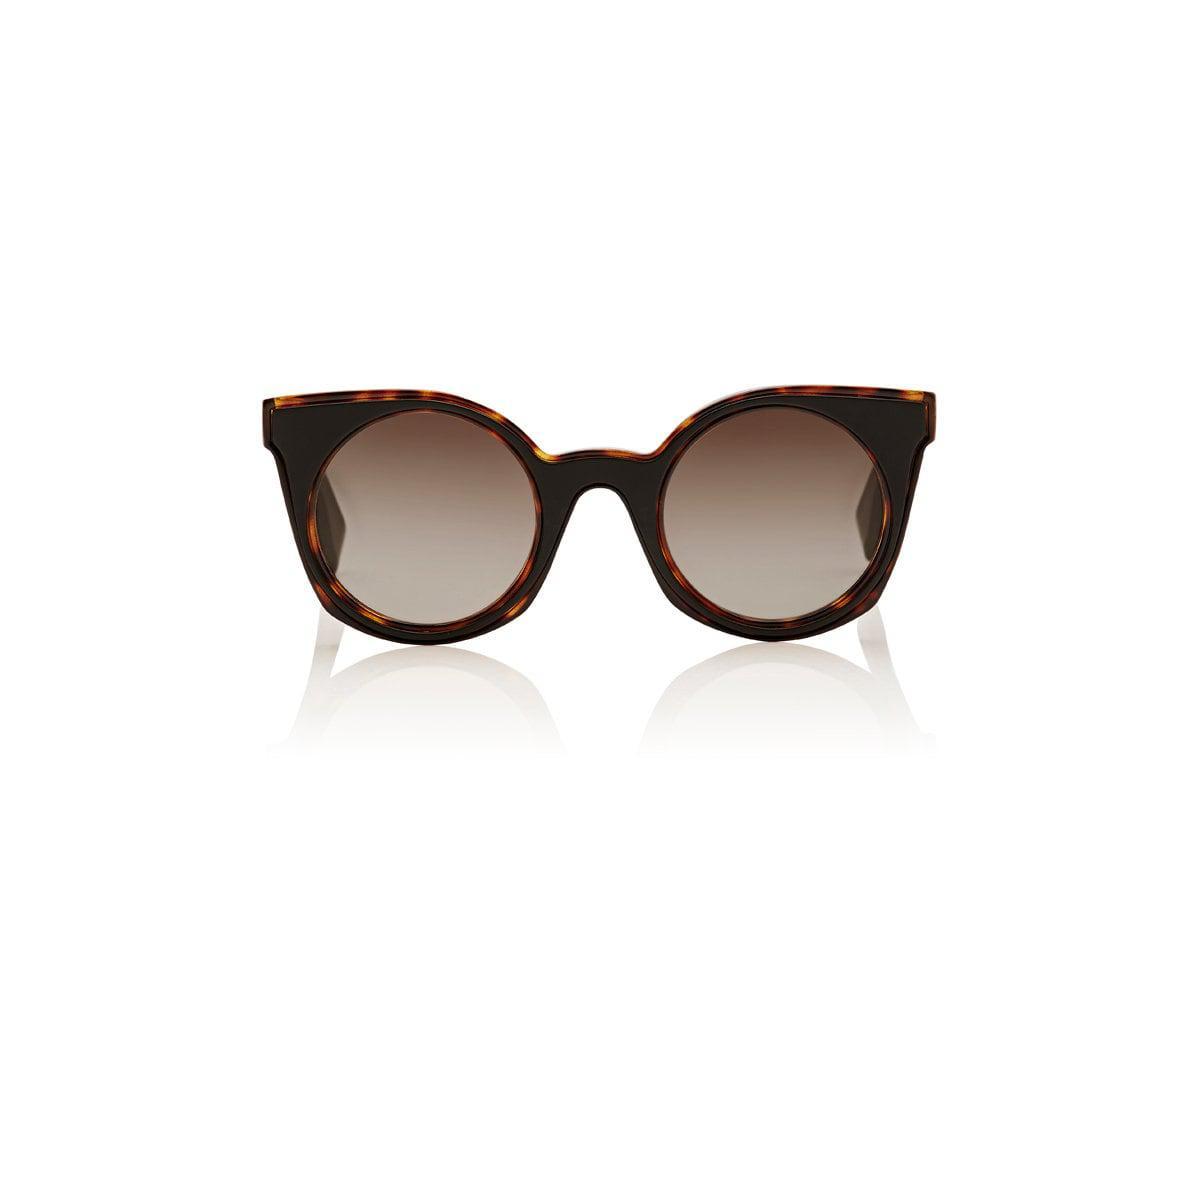 7c3e1824e336 Gallery. Previously sold at  Barneys New York · Women s Gradient Sunglasses  ...